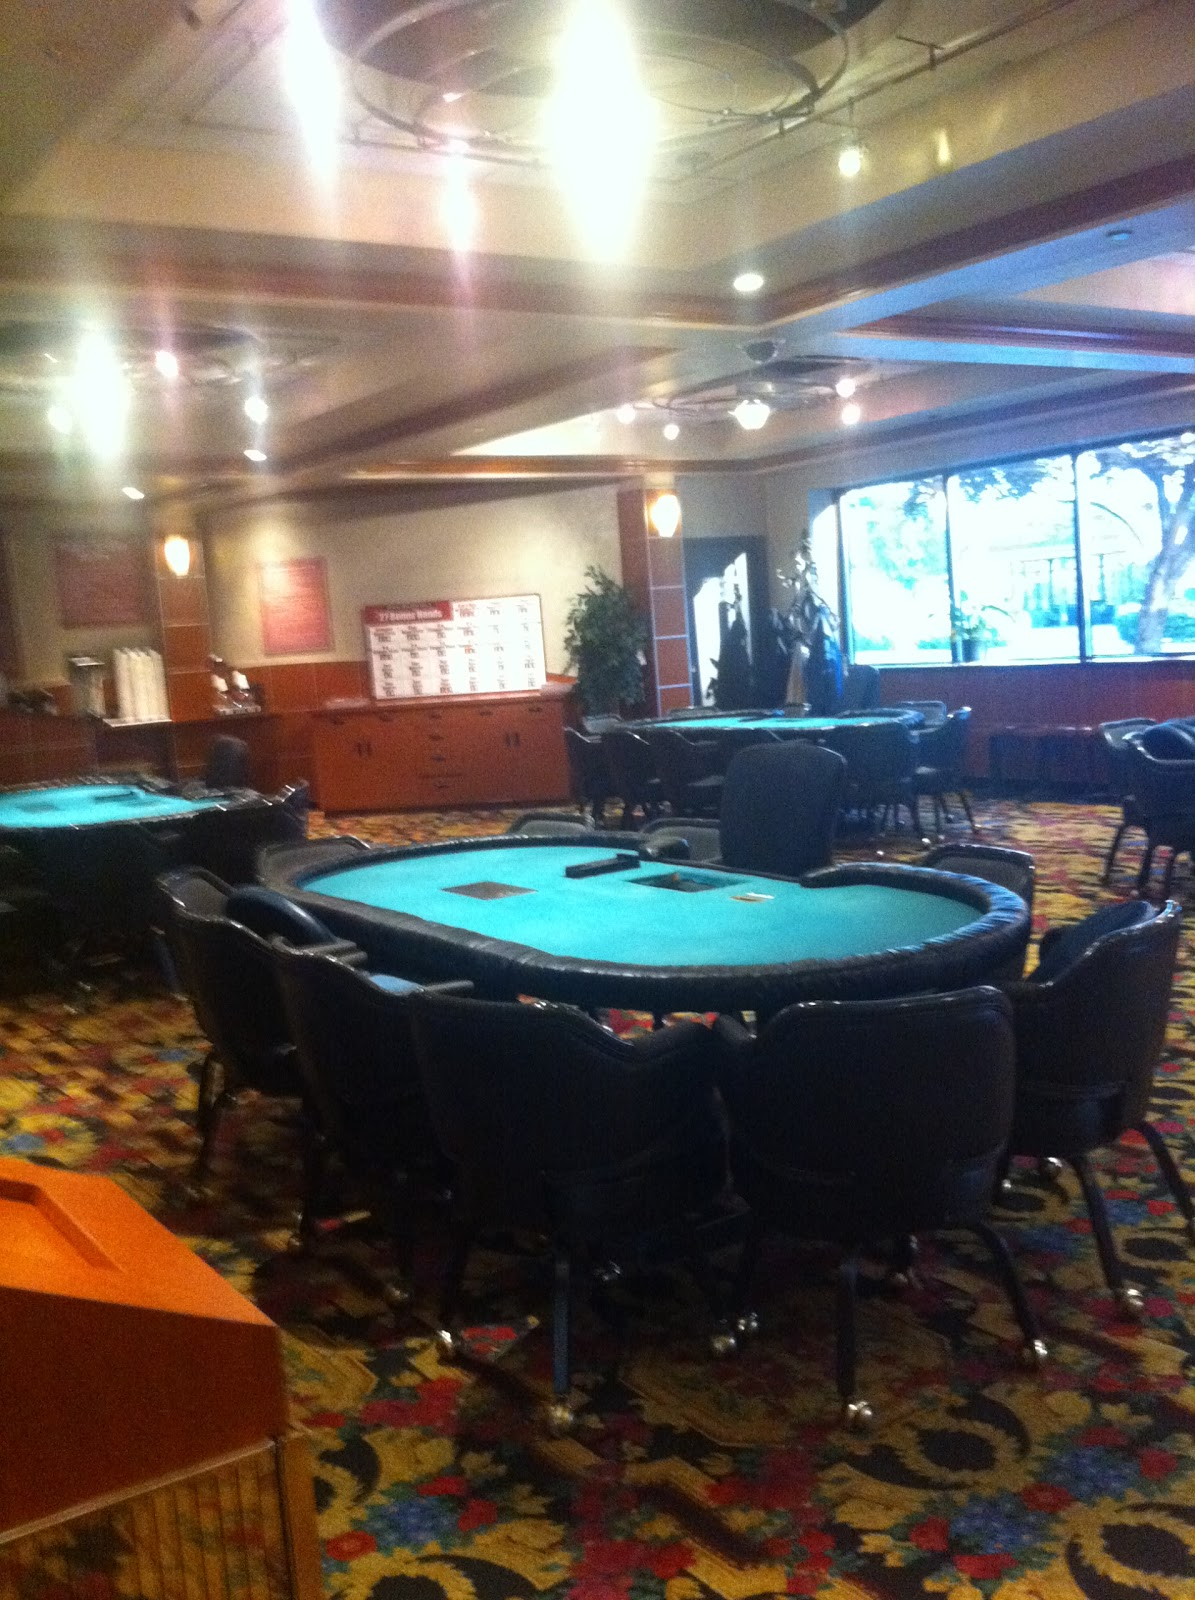 Dejope casino poker room casino online italiano